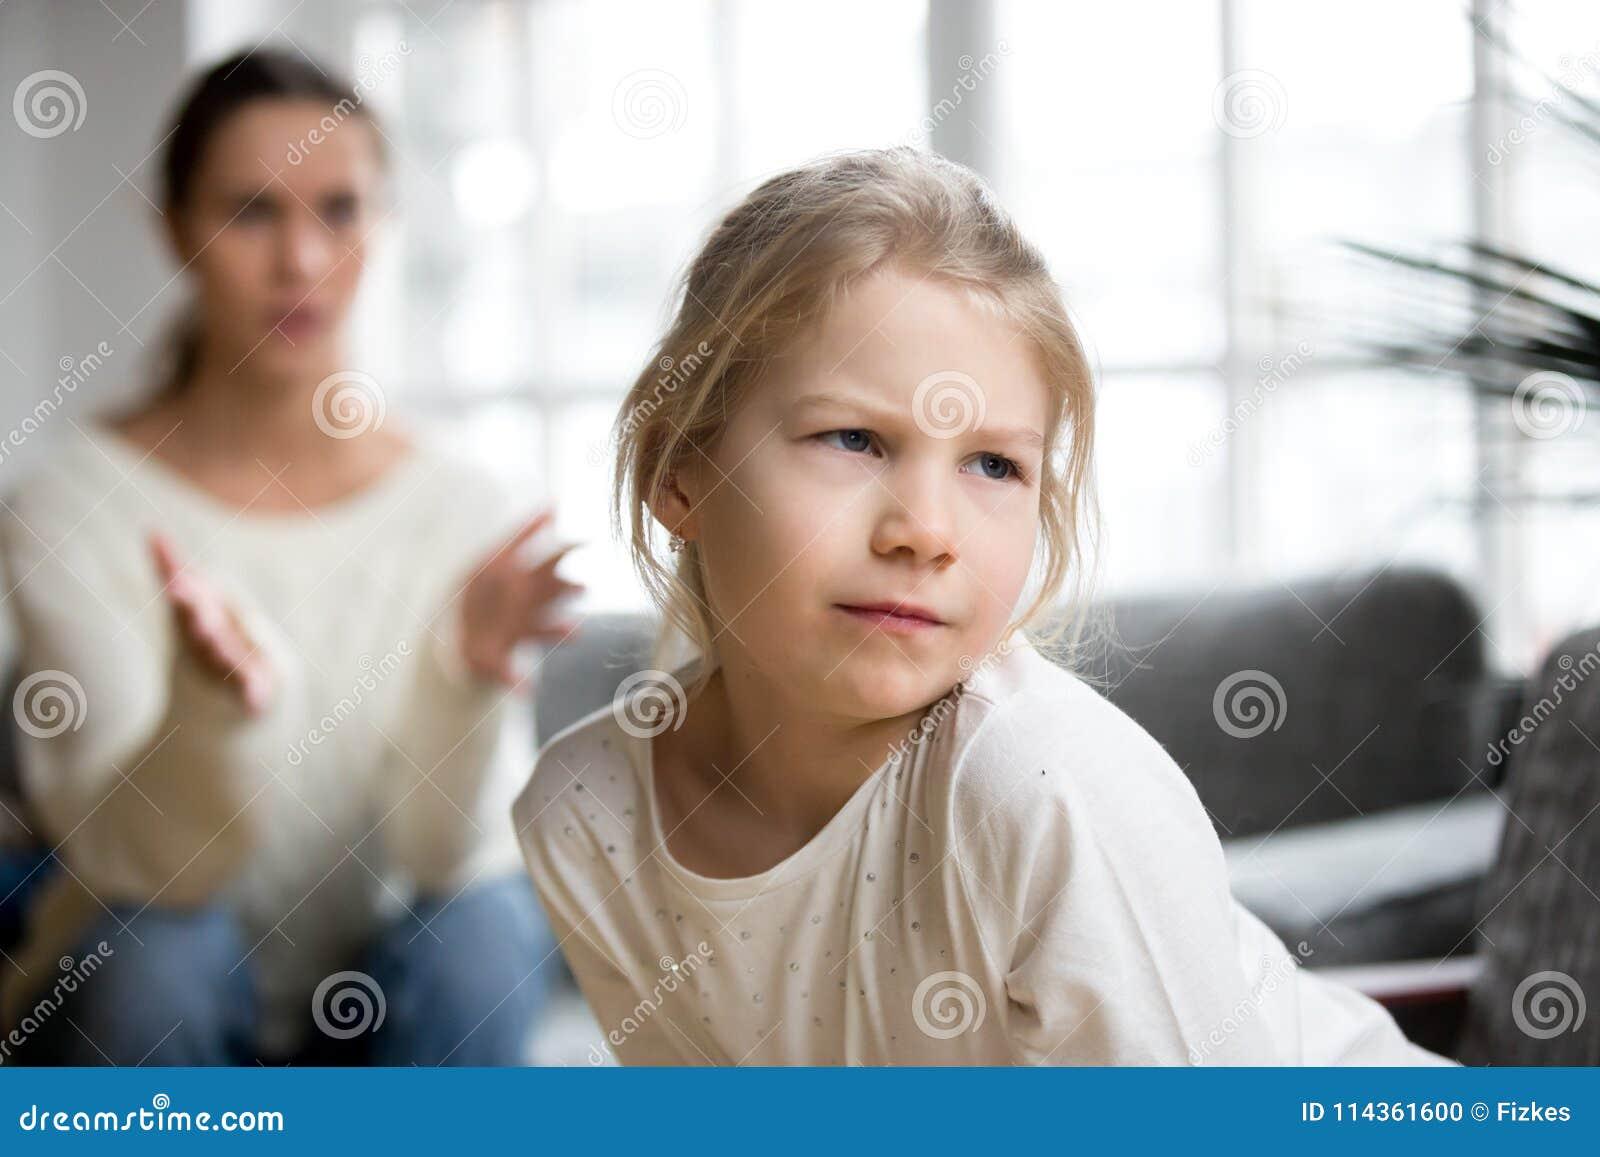 Sulky κορίτσι παιδιών που μουτρώνει αγνοώντας τη μητέρα που επιπλήττει το χ